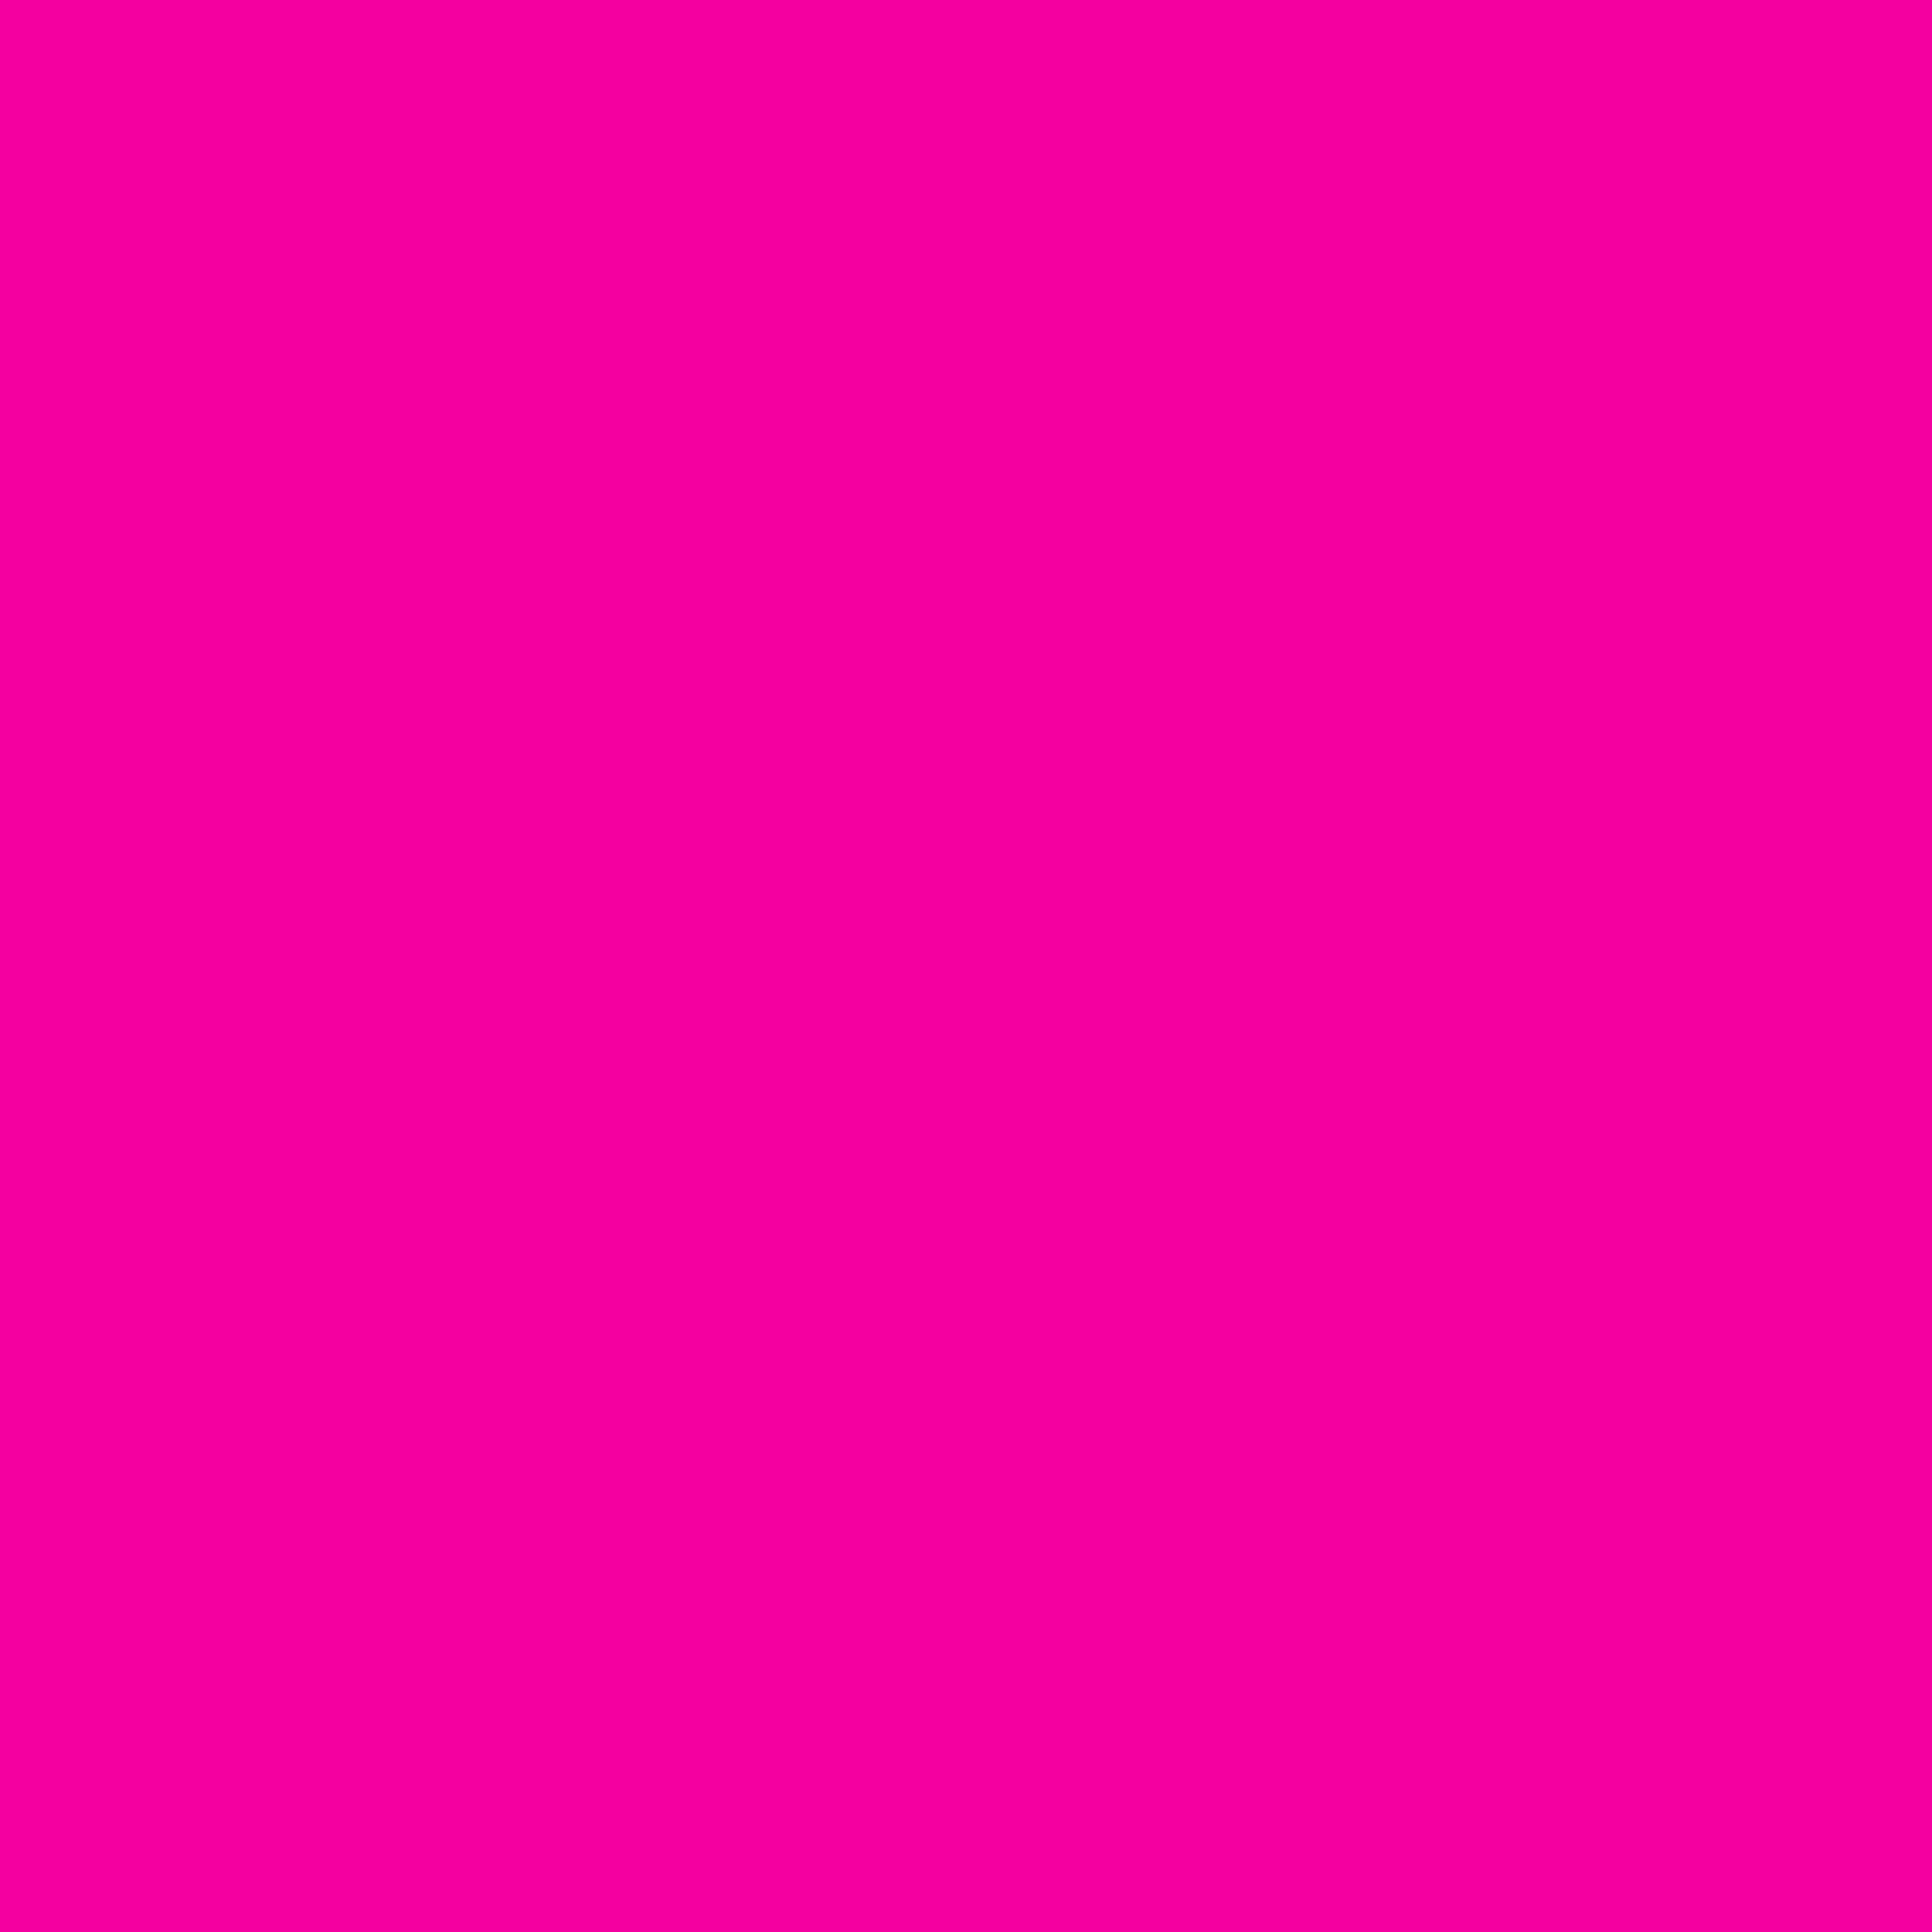 3600x3600 Fashion Fuchsia Solid Color Background